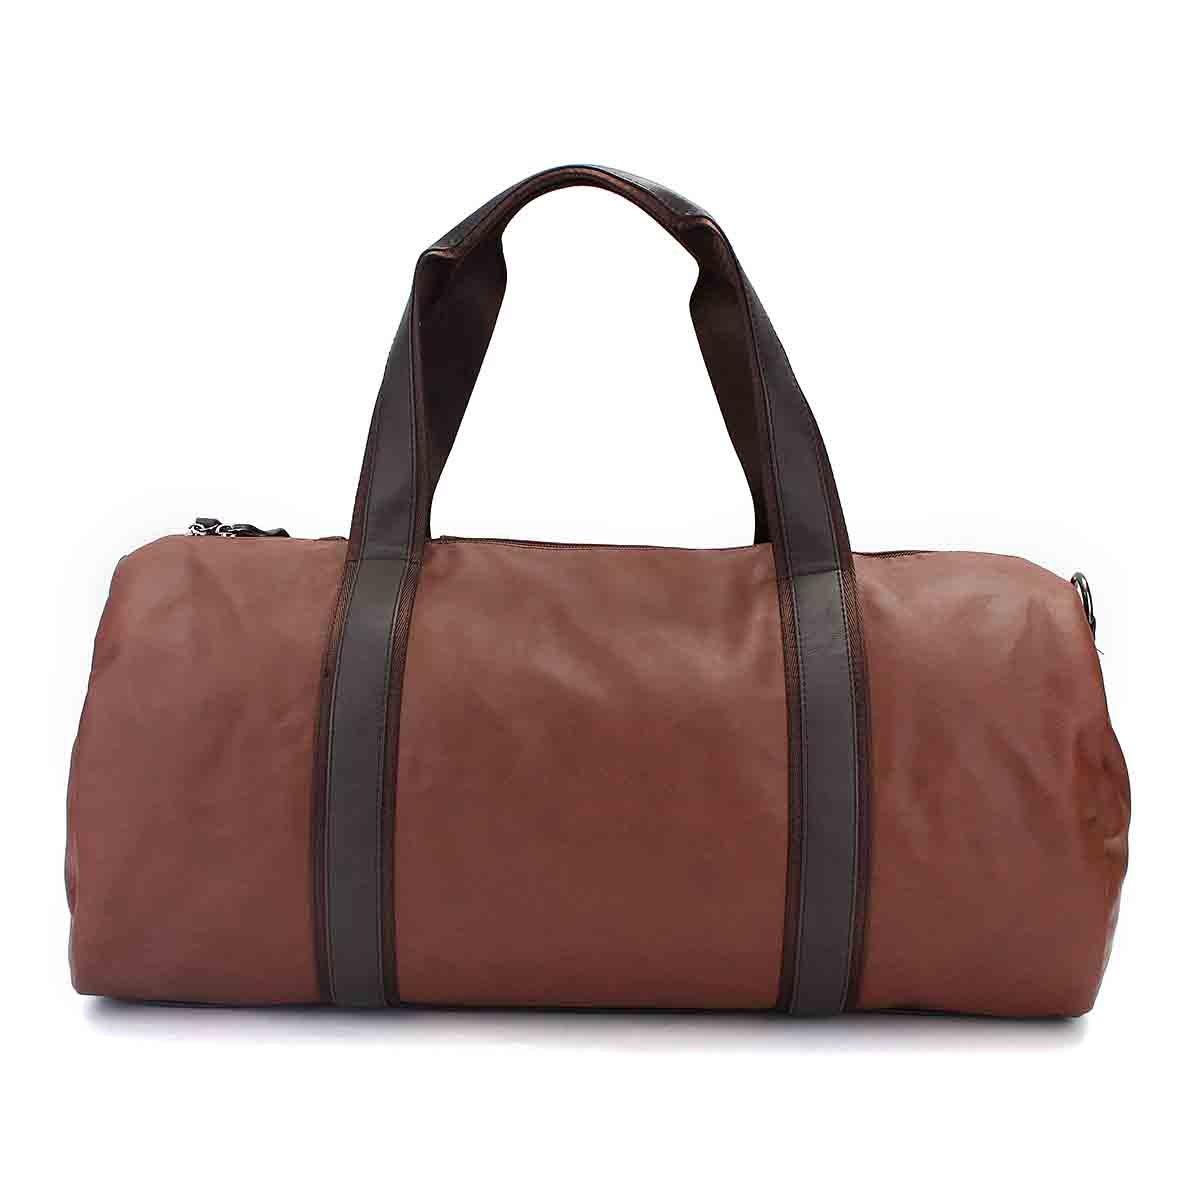 OURBAG Mens Gym Bag Large Leather Travel Tote Luggage Weekender Duffle Bag Brown